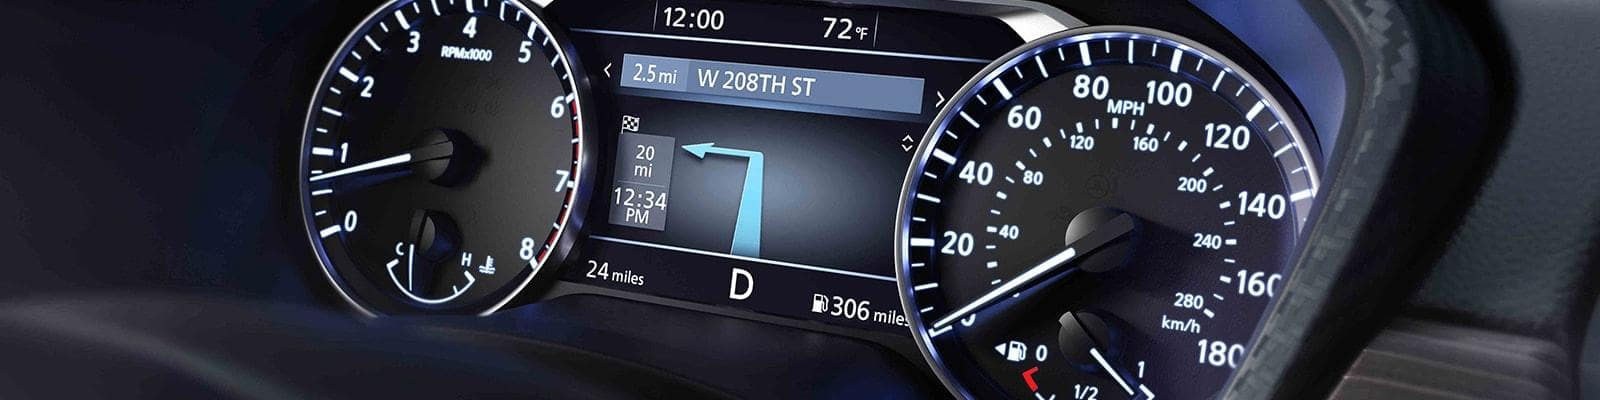 Nissan Sentra Dashboard Lights Faulkner Nissan Jenkintown Pa